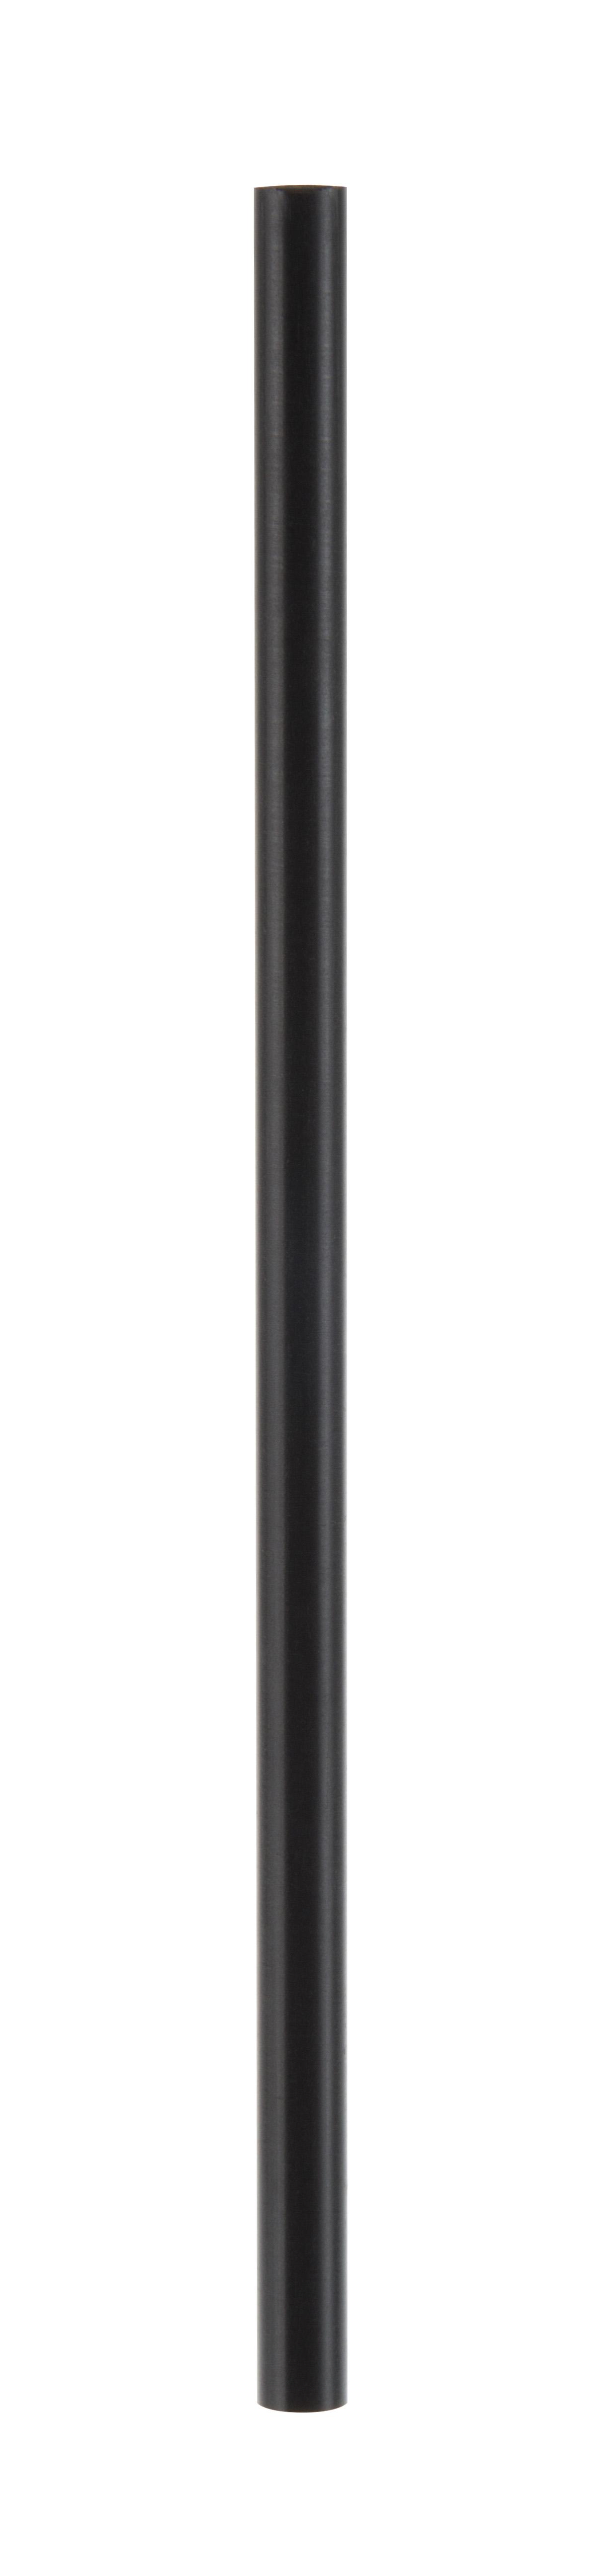 Uhmw Black Reprocessed Rod Acme Plastics Inc